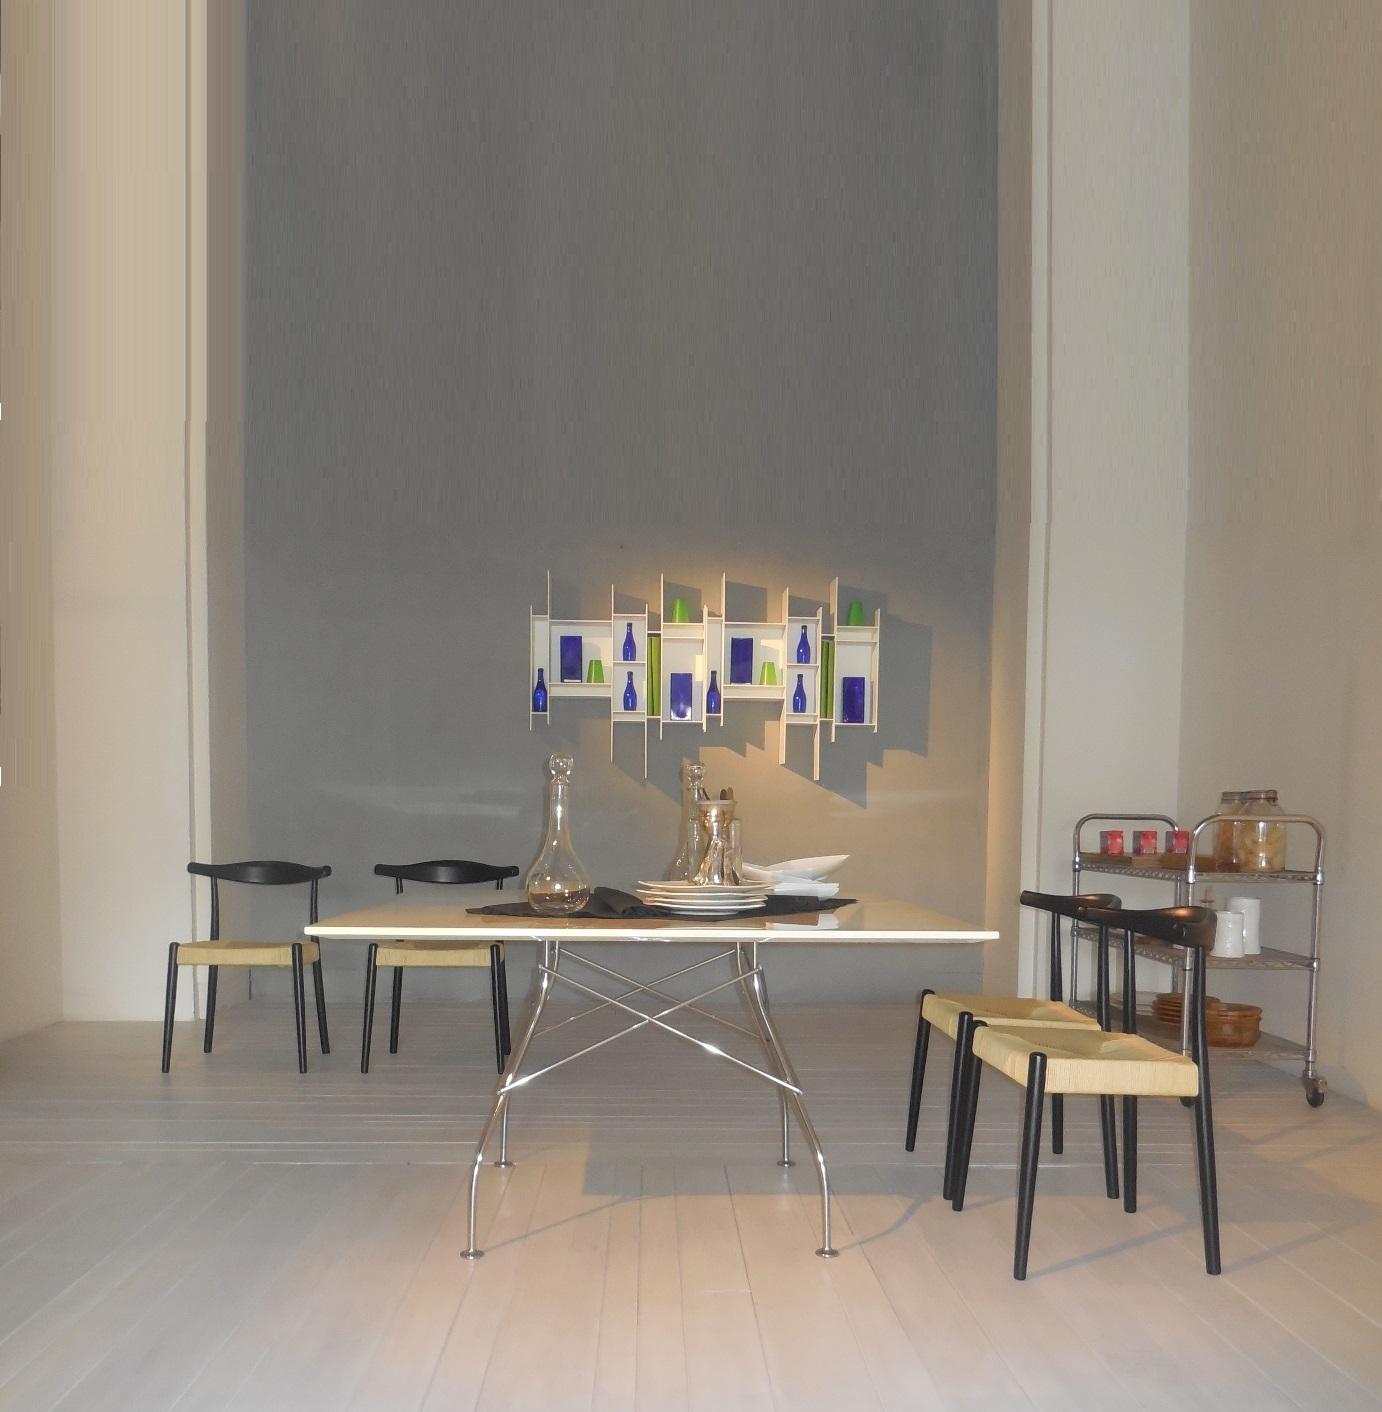 Tavolo kartell offerta kartell glossy tavolo quadrato - Tavolo four kartell prezzo ...